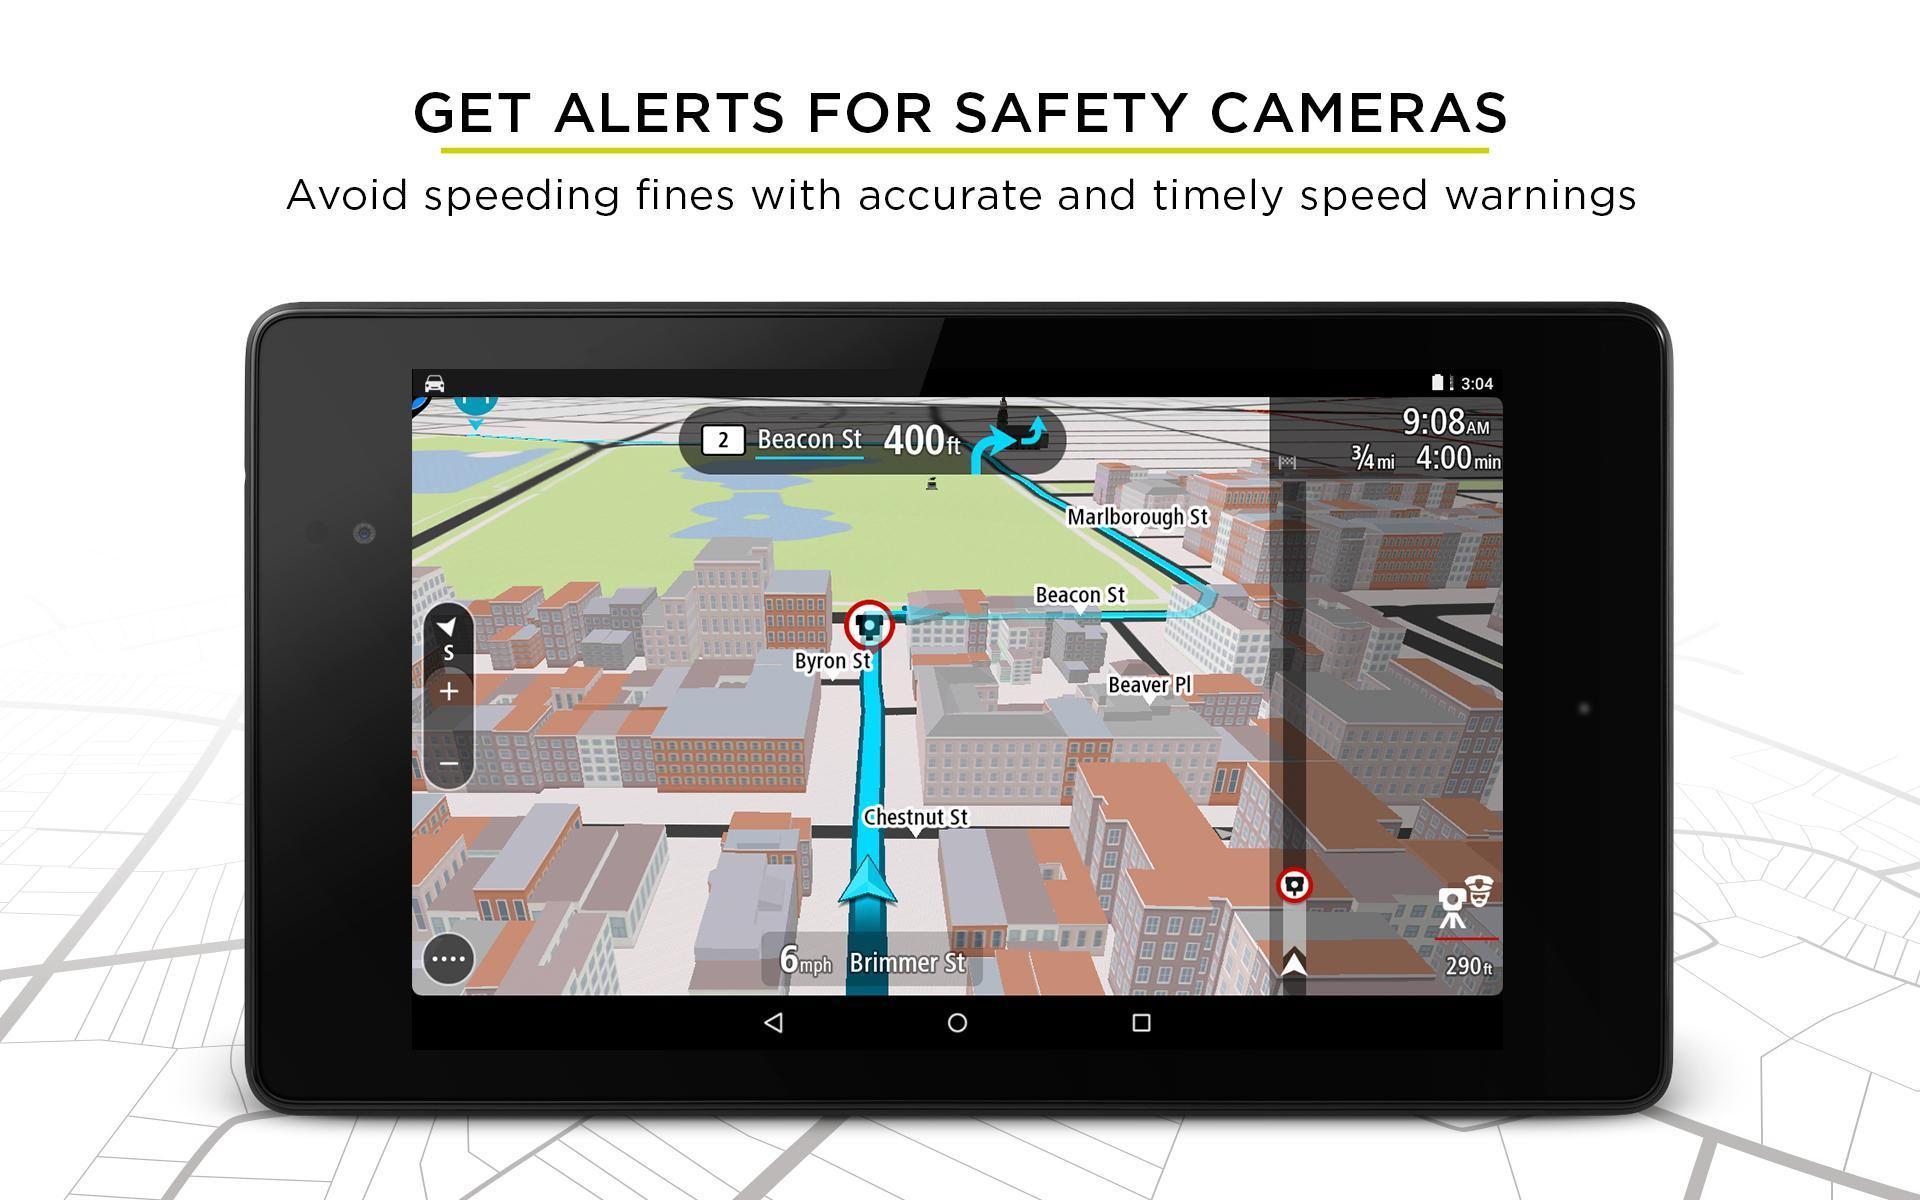 TomTom GPS Navigation - Live Traffic Alerts & Maps 2.0.4 Screenshot 19